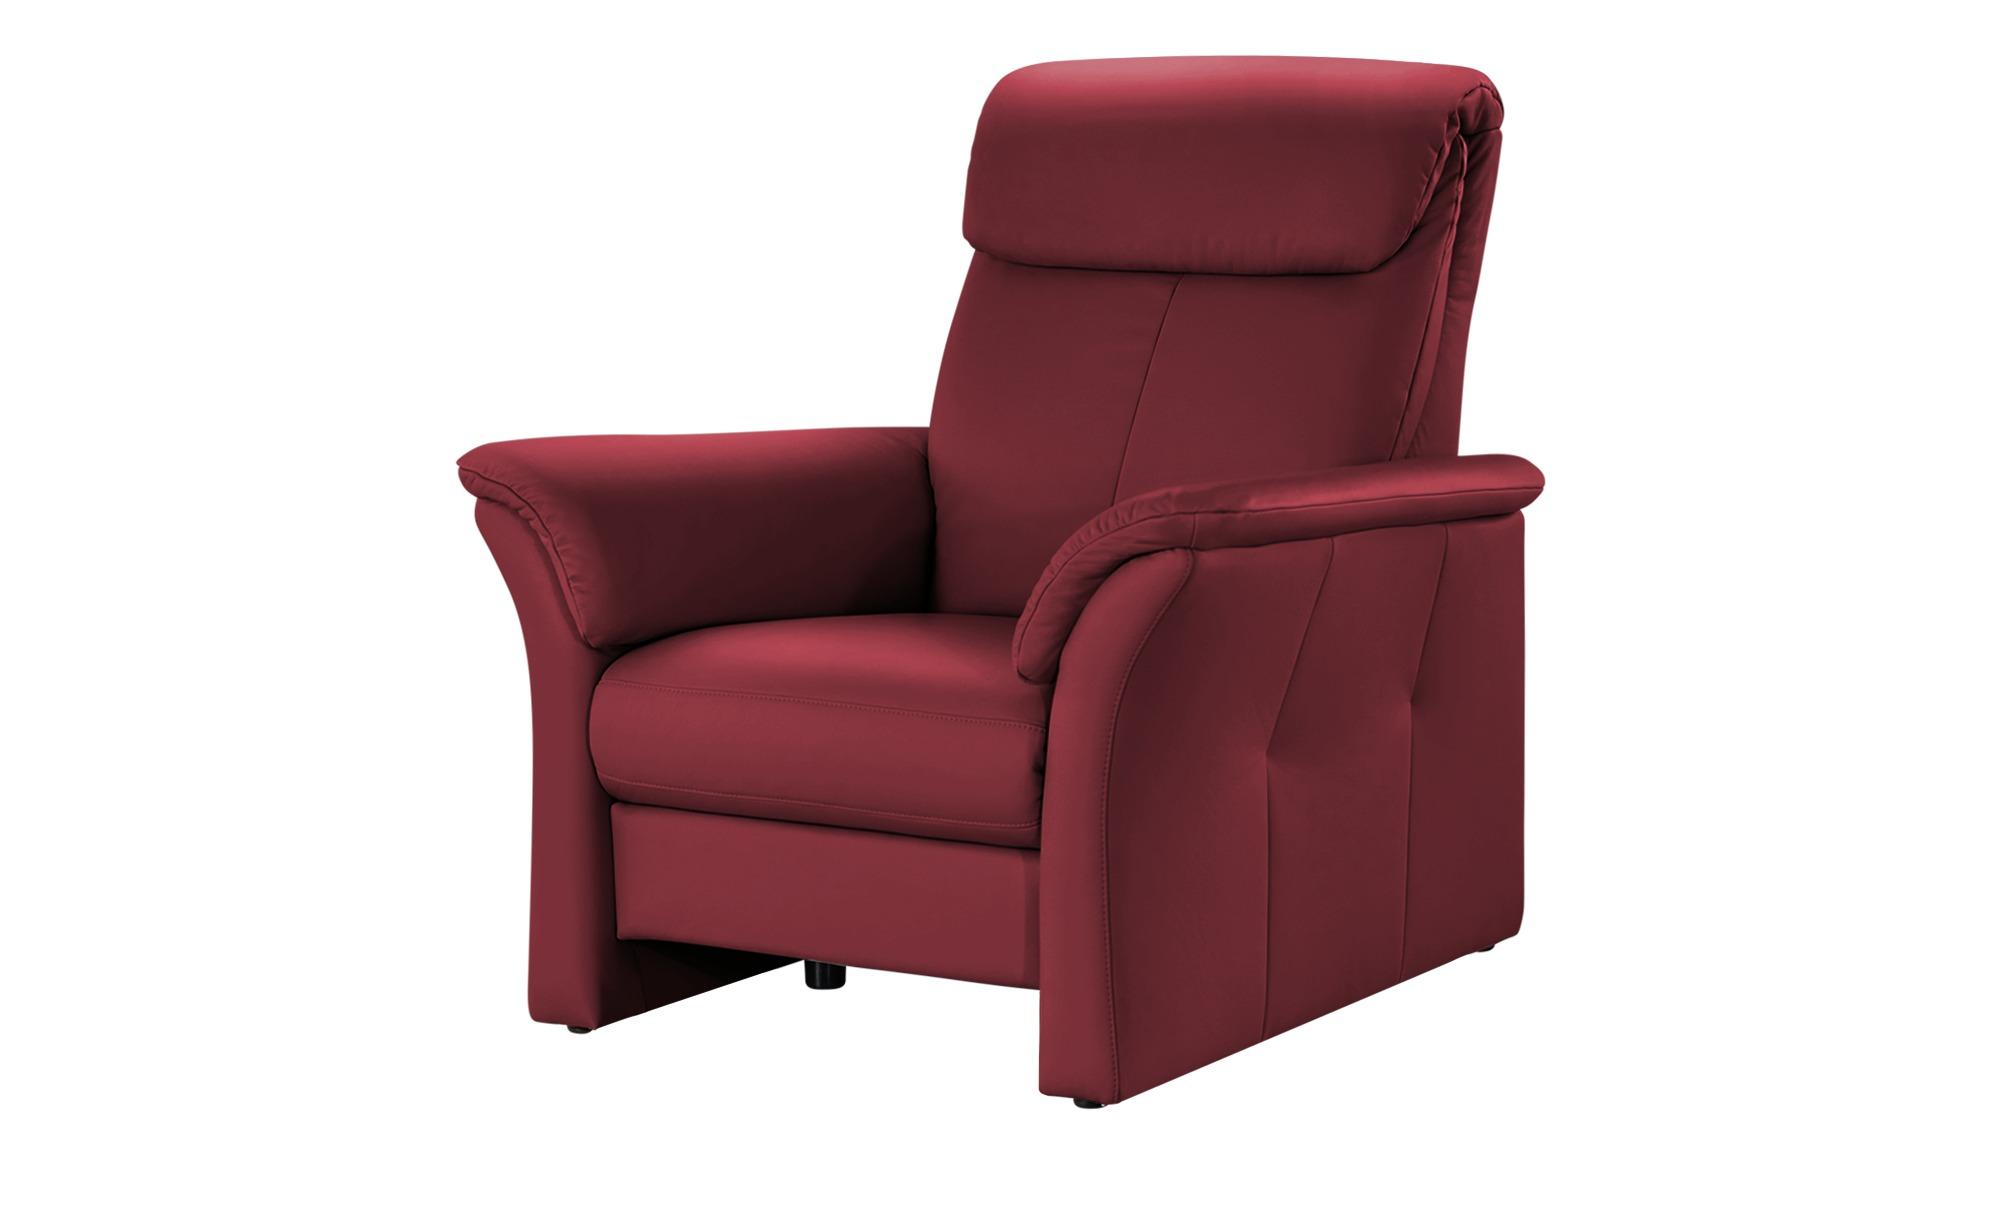 Wohnwert Ledersessel  Lena ¦ rot ¦ Maße (cm): B: 104,5 H: 107 T: 97 Polstermöbel > Sessel > Ledersessel - Höffner